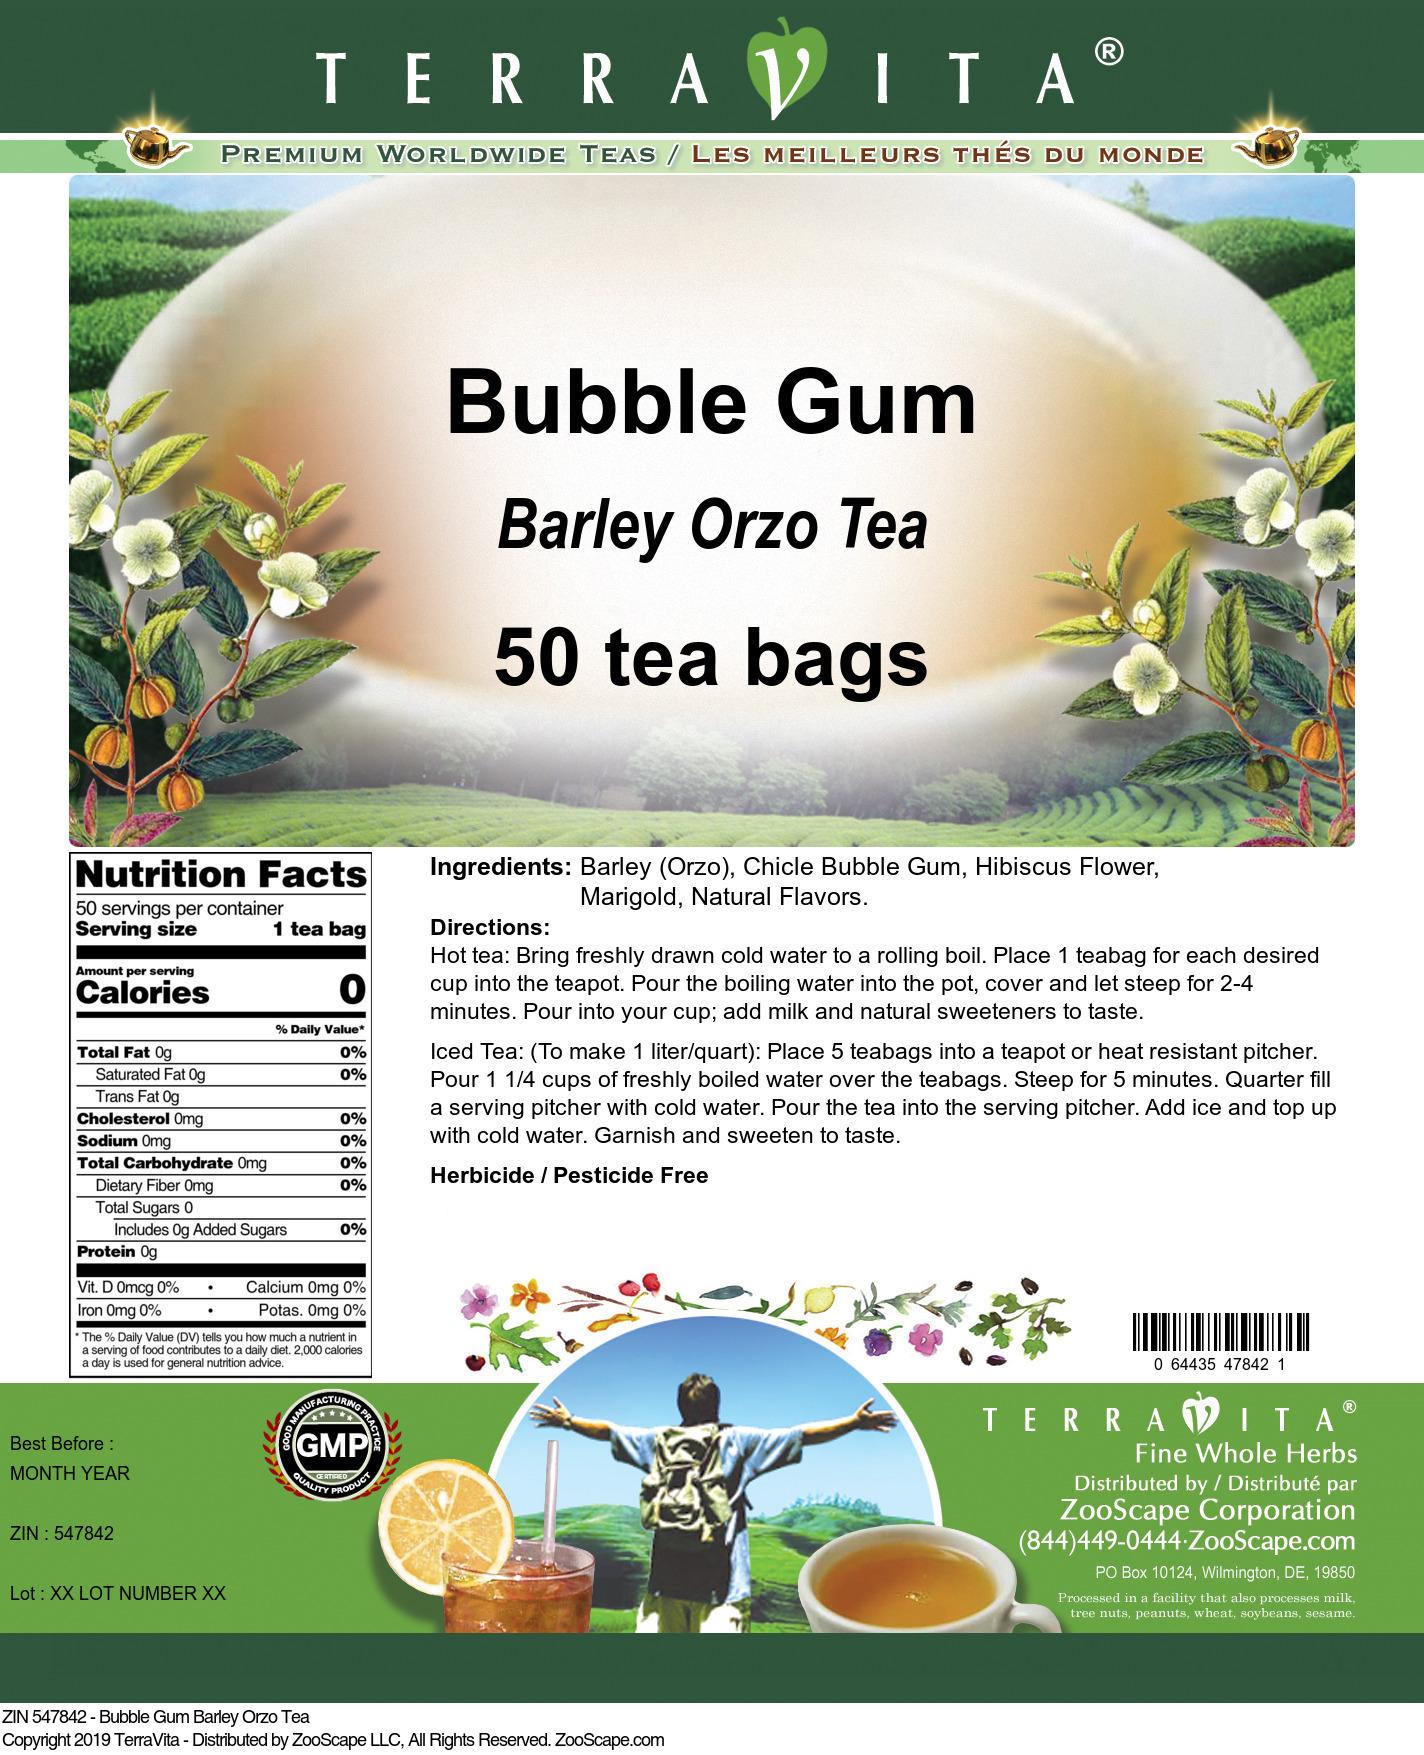 Bubble Gum Barley Orzo